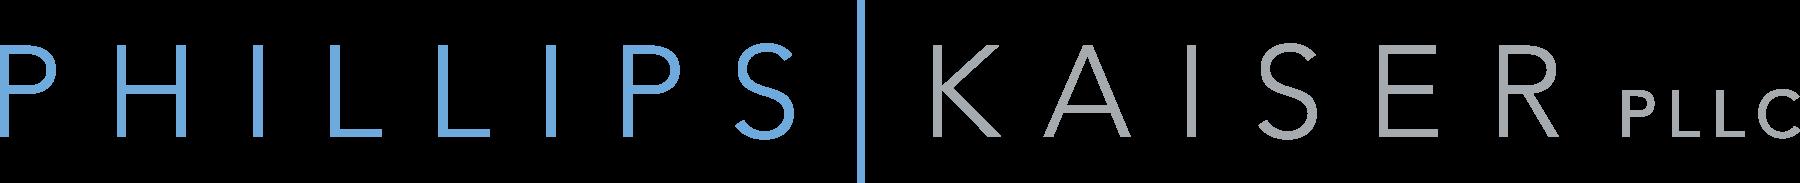 Coralina Rivera - Phillips | Kaiser - Houston Business Attorneys